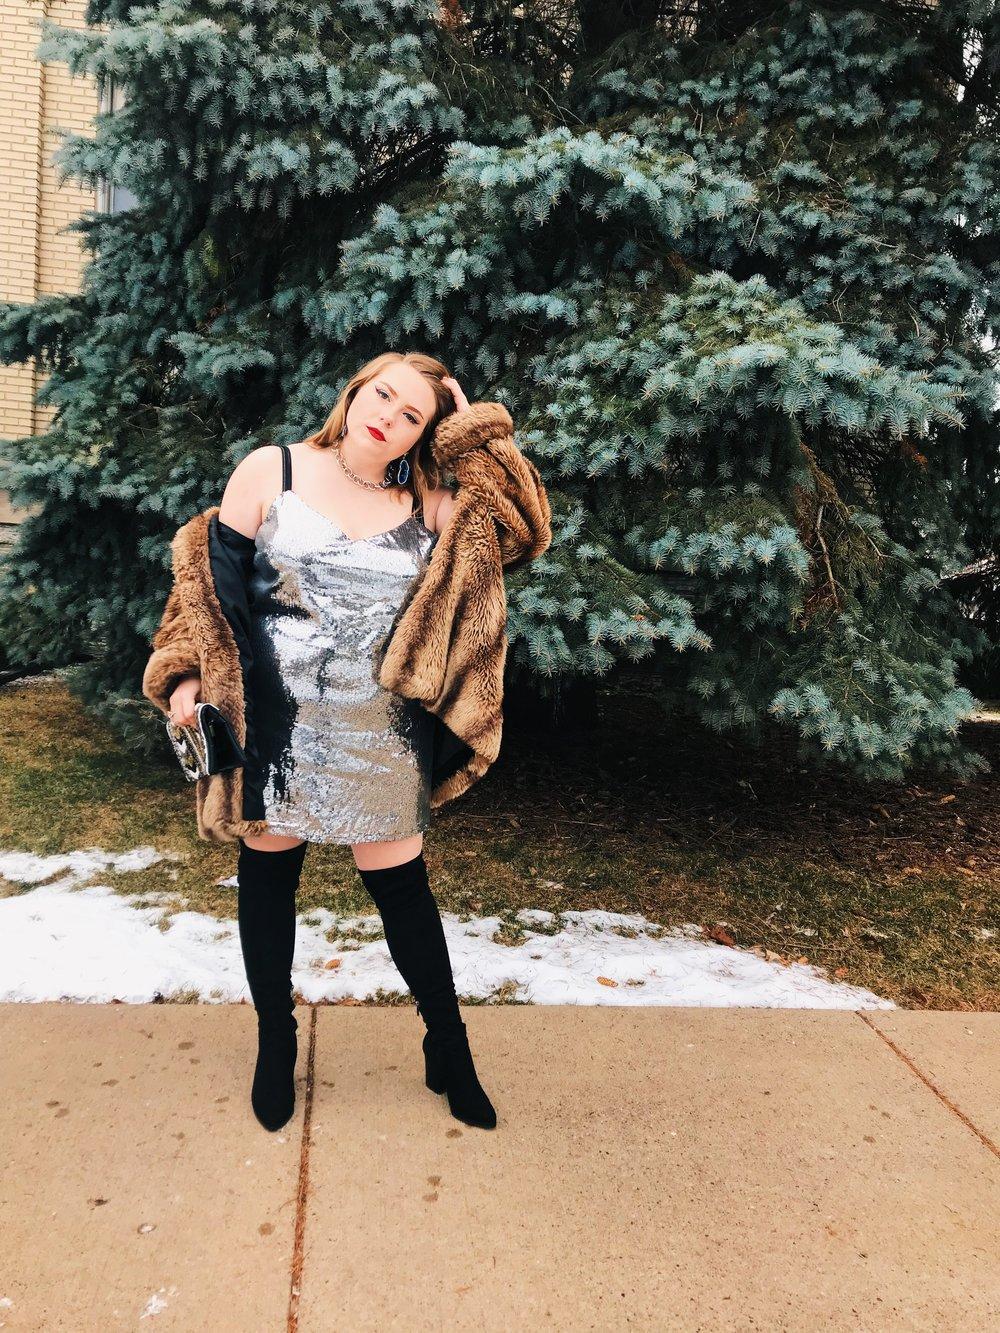 Silver Glimmer - Model: Cody FlahertyDress: TargetPurse: ThriftedCoat: Community Clothing SwapNecklace: Forever 21Earrings: BaublebarBoots: Nordstrom Rack